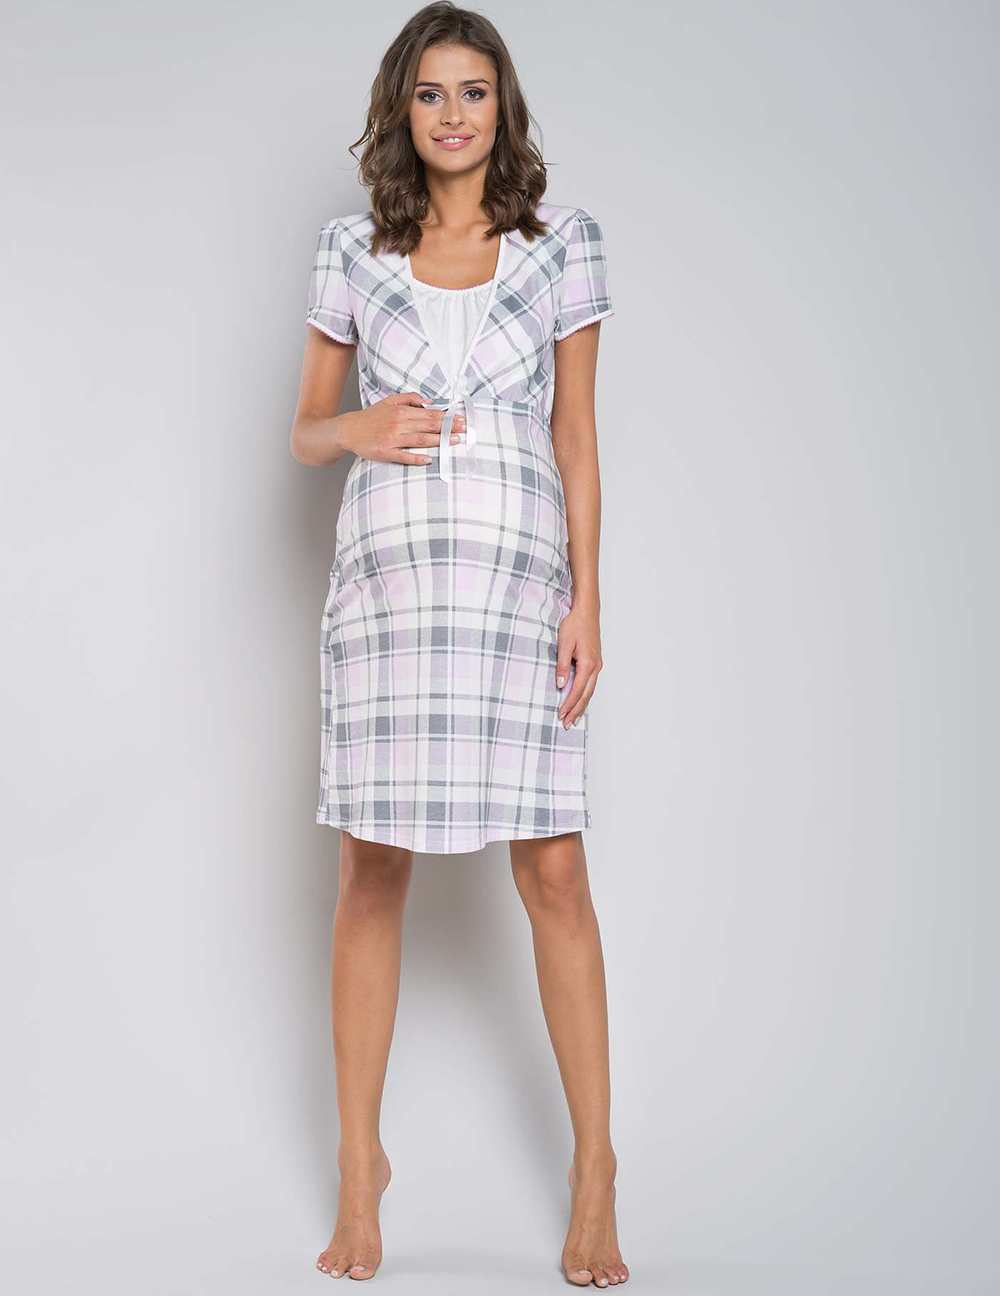 f1fbaa1e25ff02 Koszula nocna Italian Fashion HANA kr.ręk. kratka. Koszula ciążowa. Koszula  ciążowa · Koszula ciążowa ...